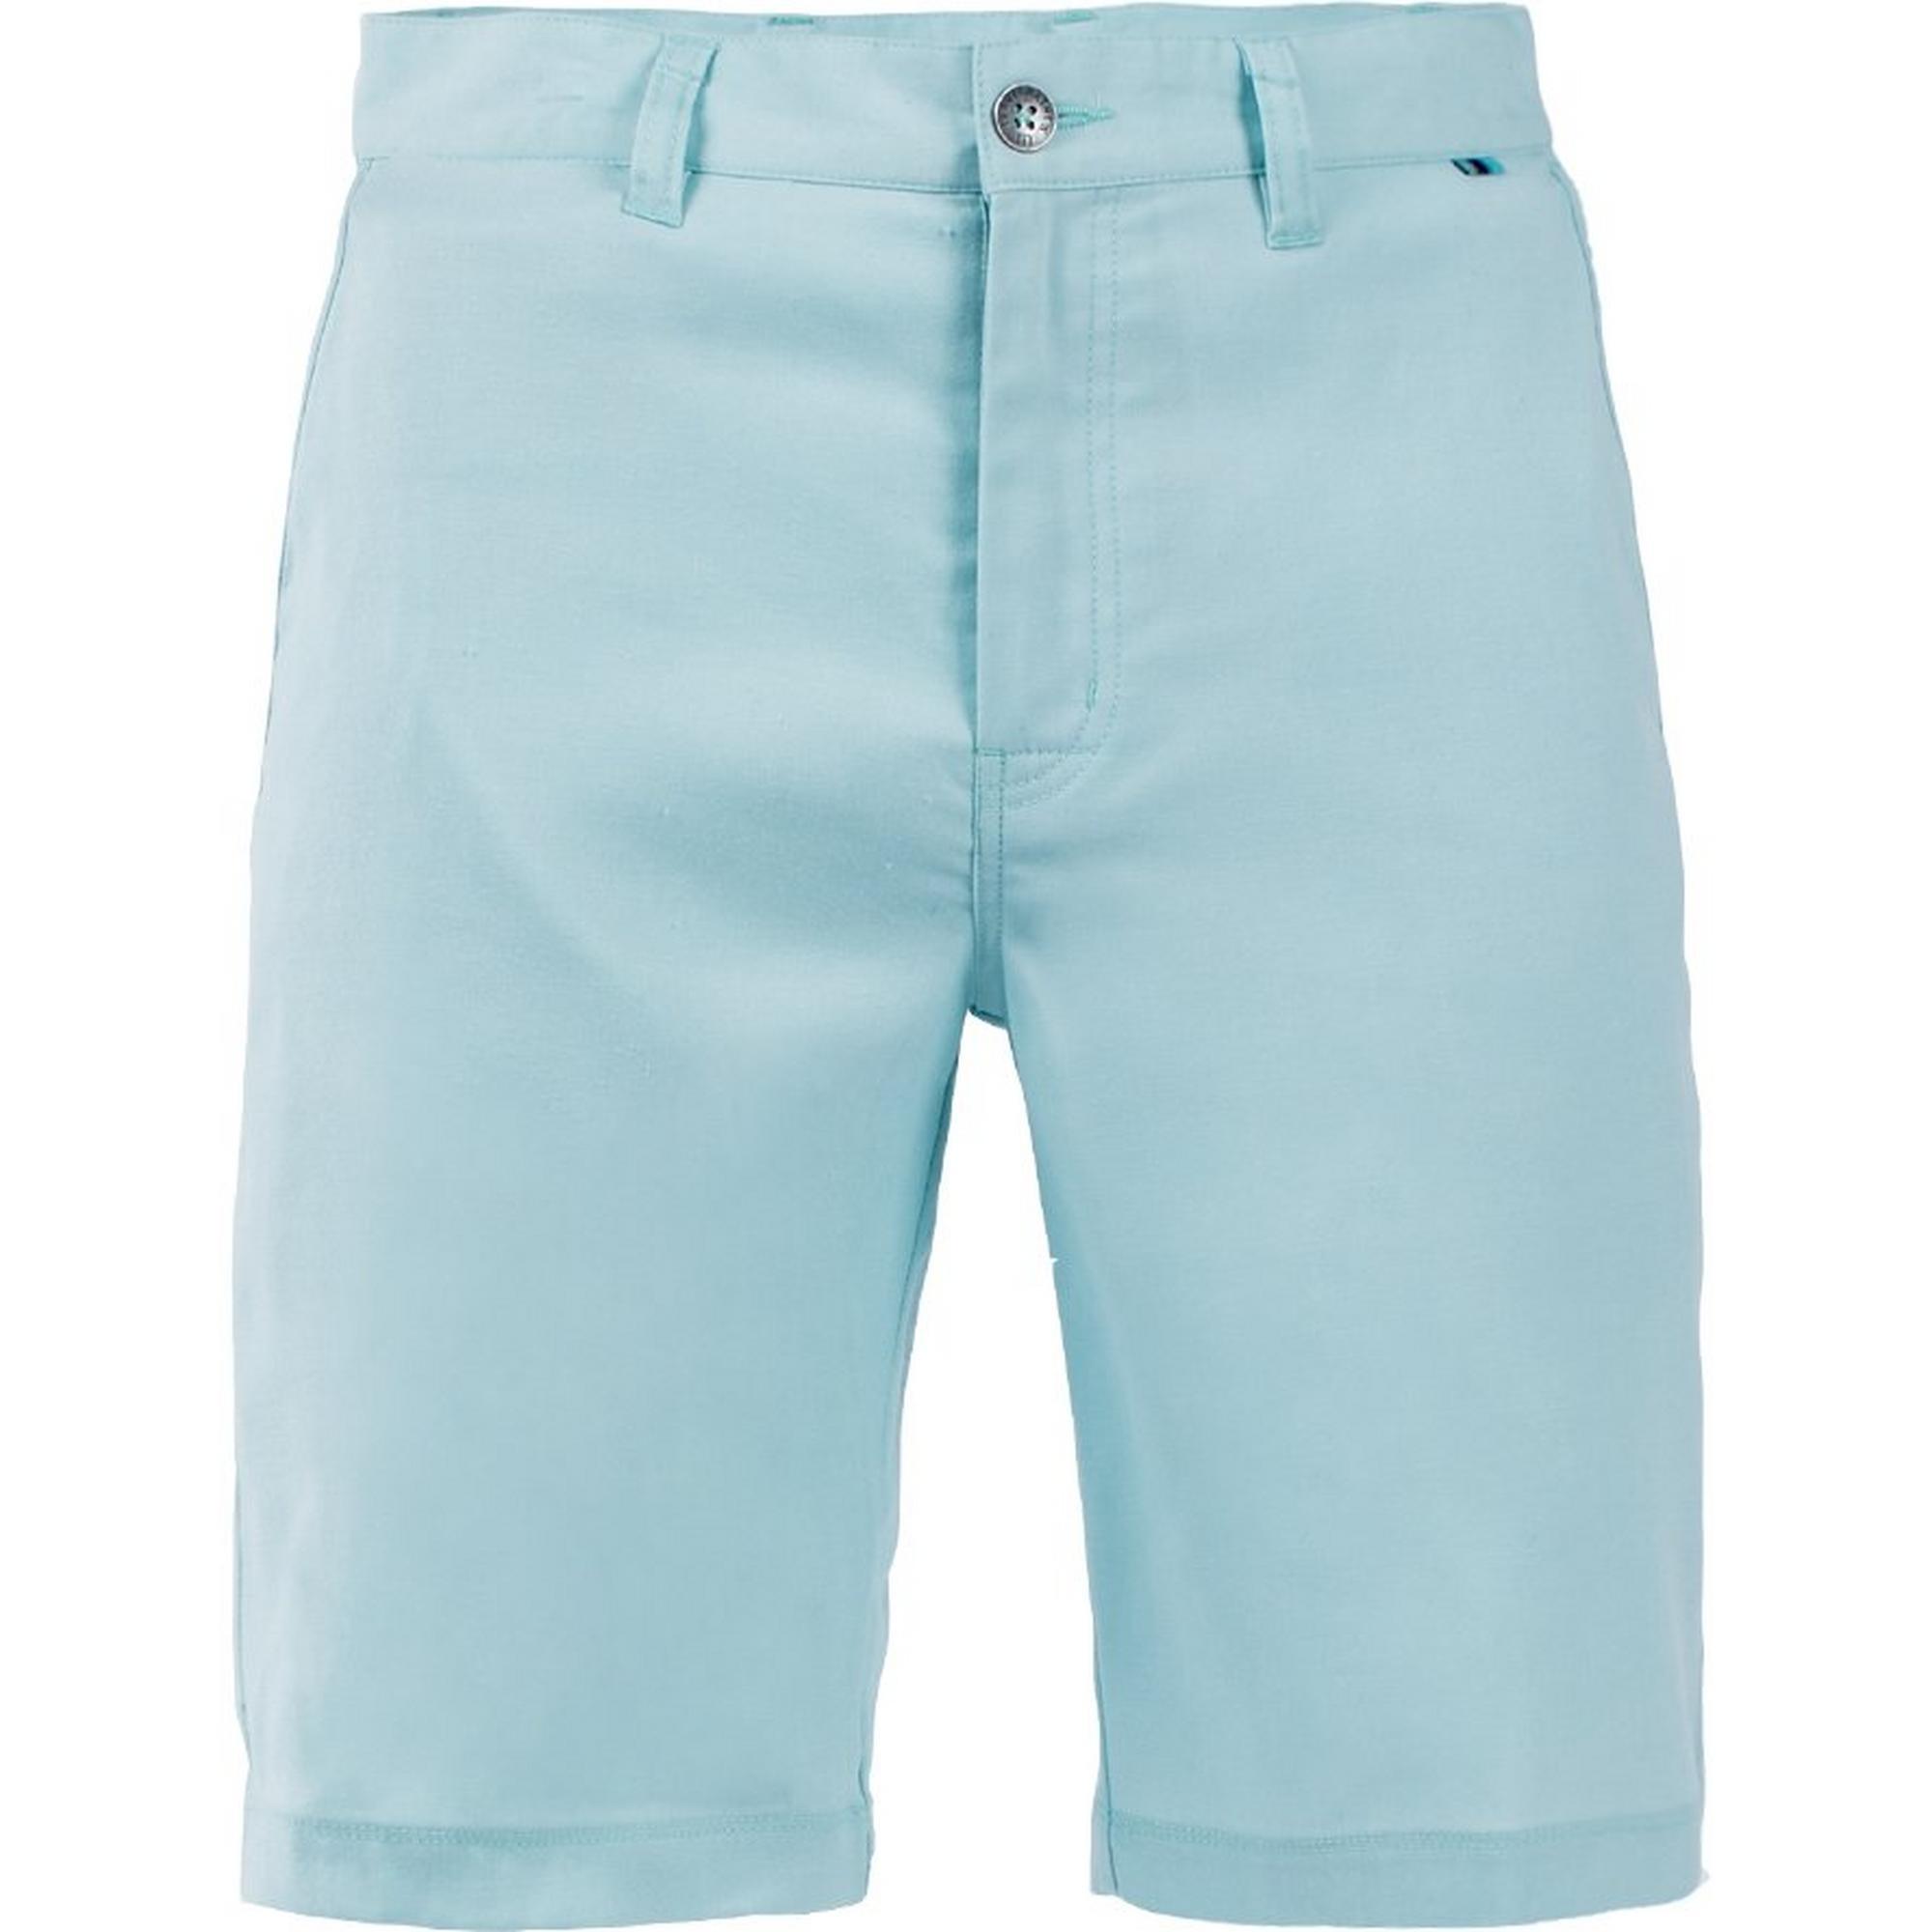 Men's Taluca Shorts